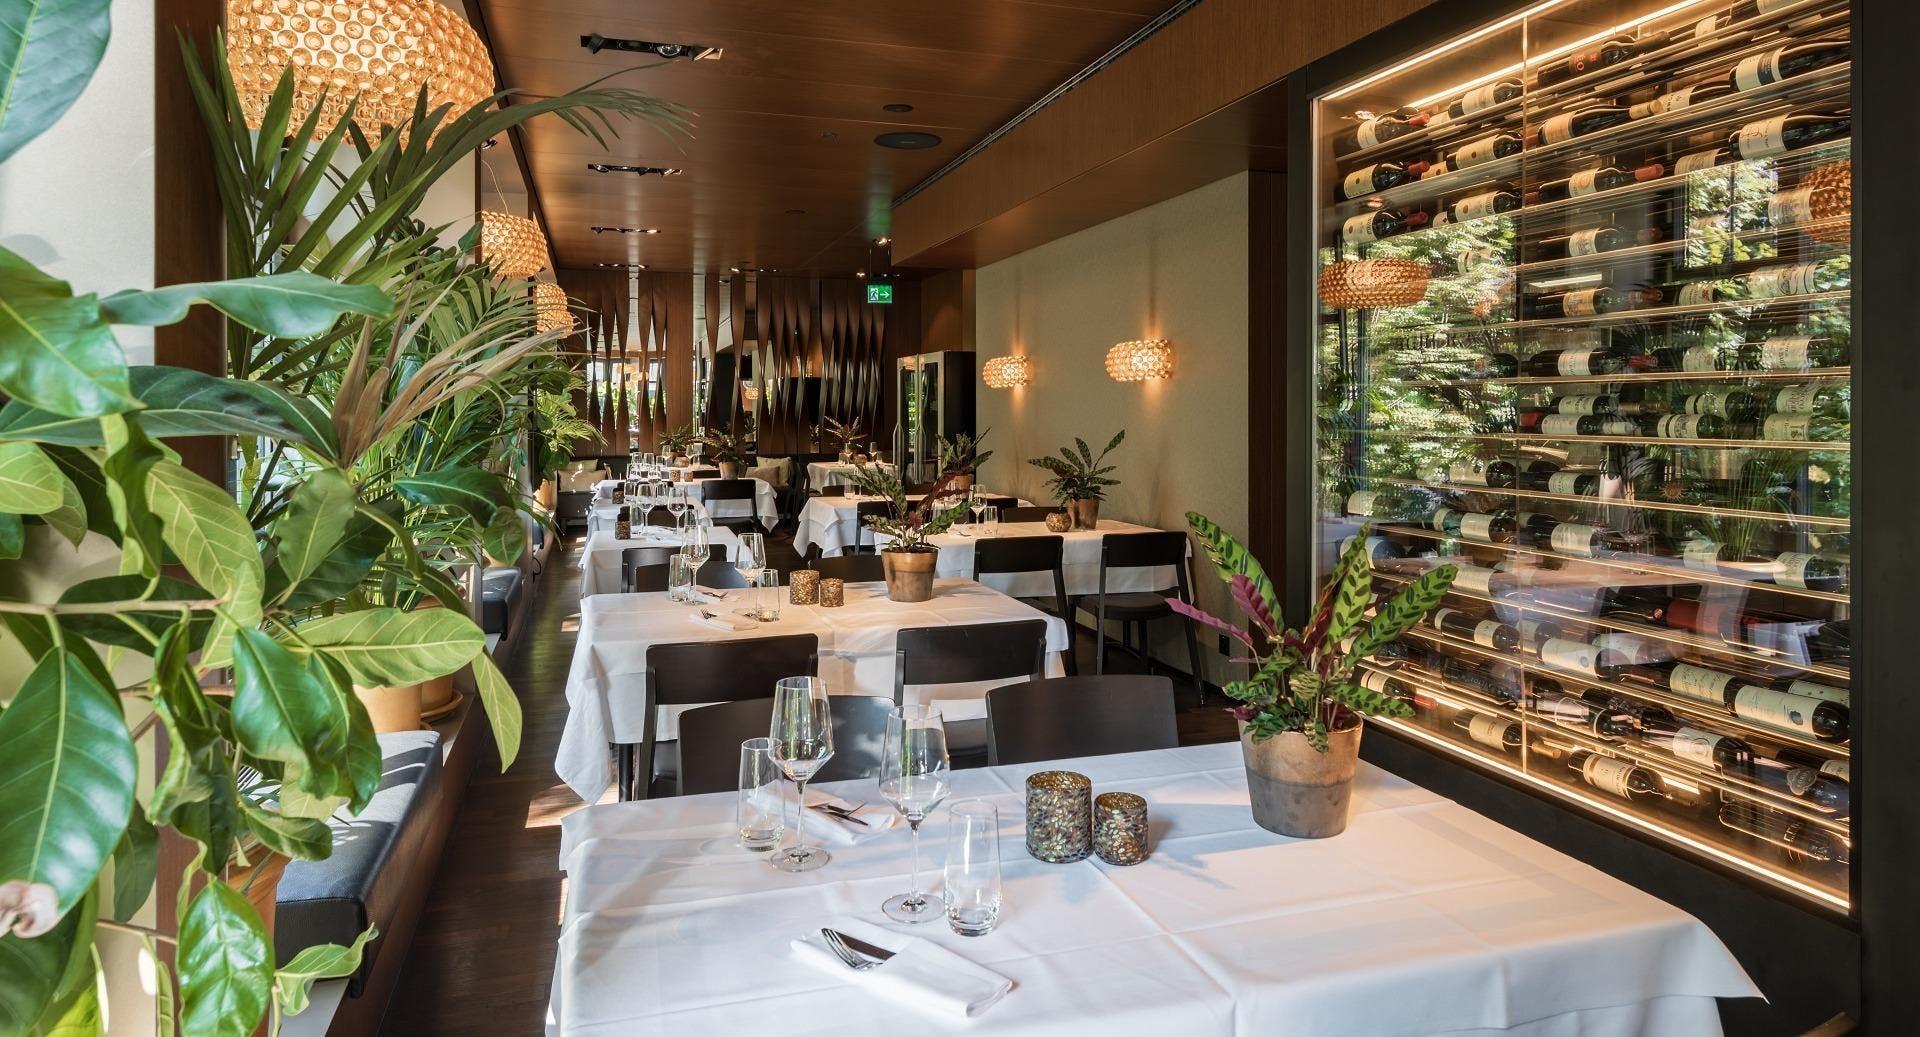 Aurora – amaze me. BAHNHOFSTRASSE I Restaurant & Bar Zurigo image 3